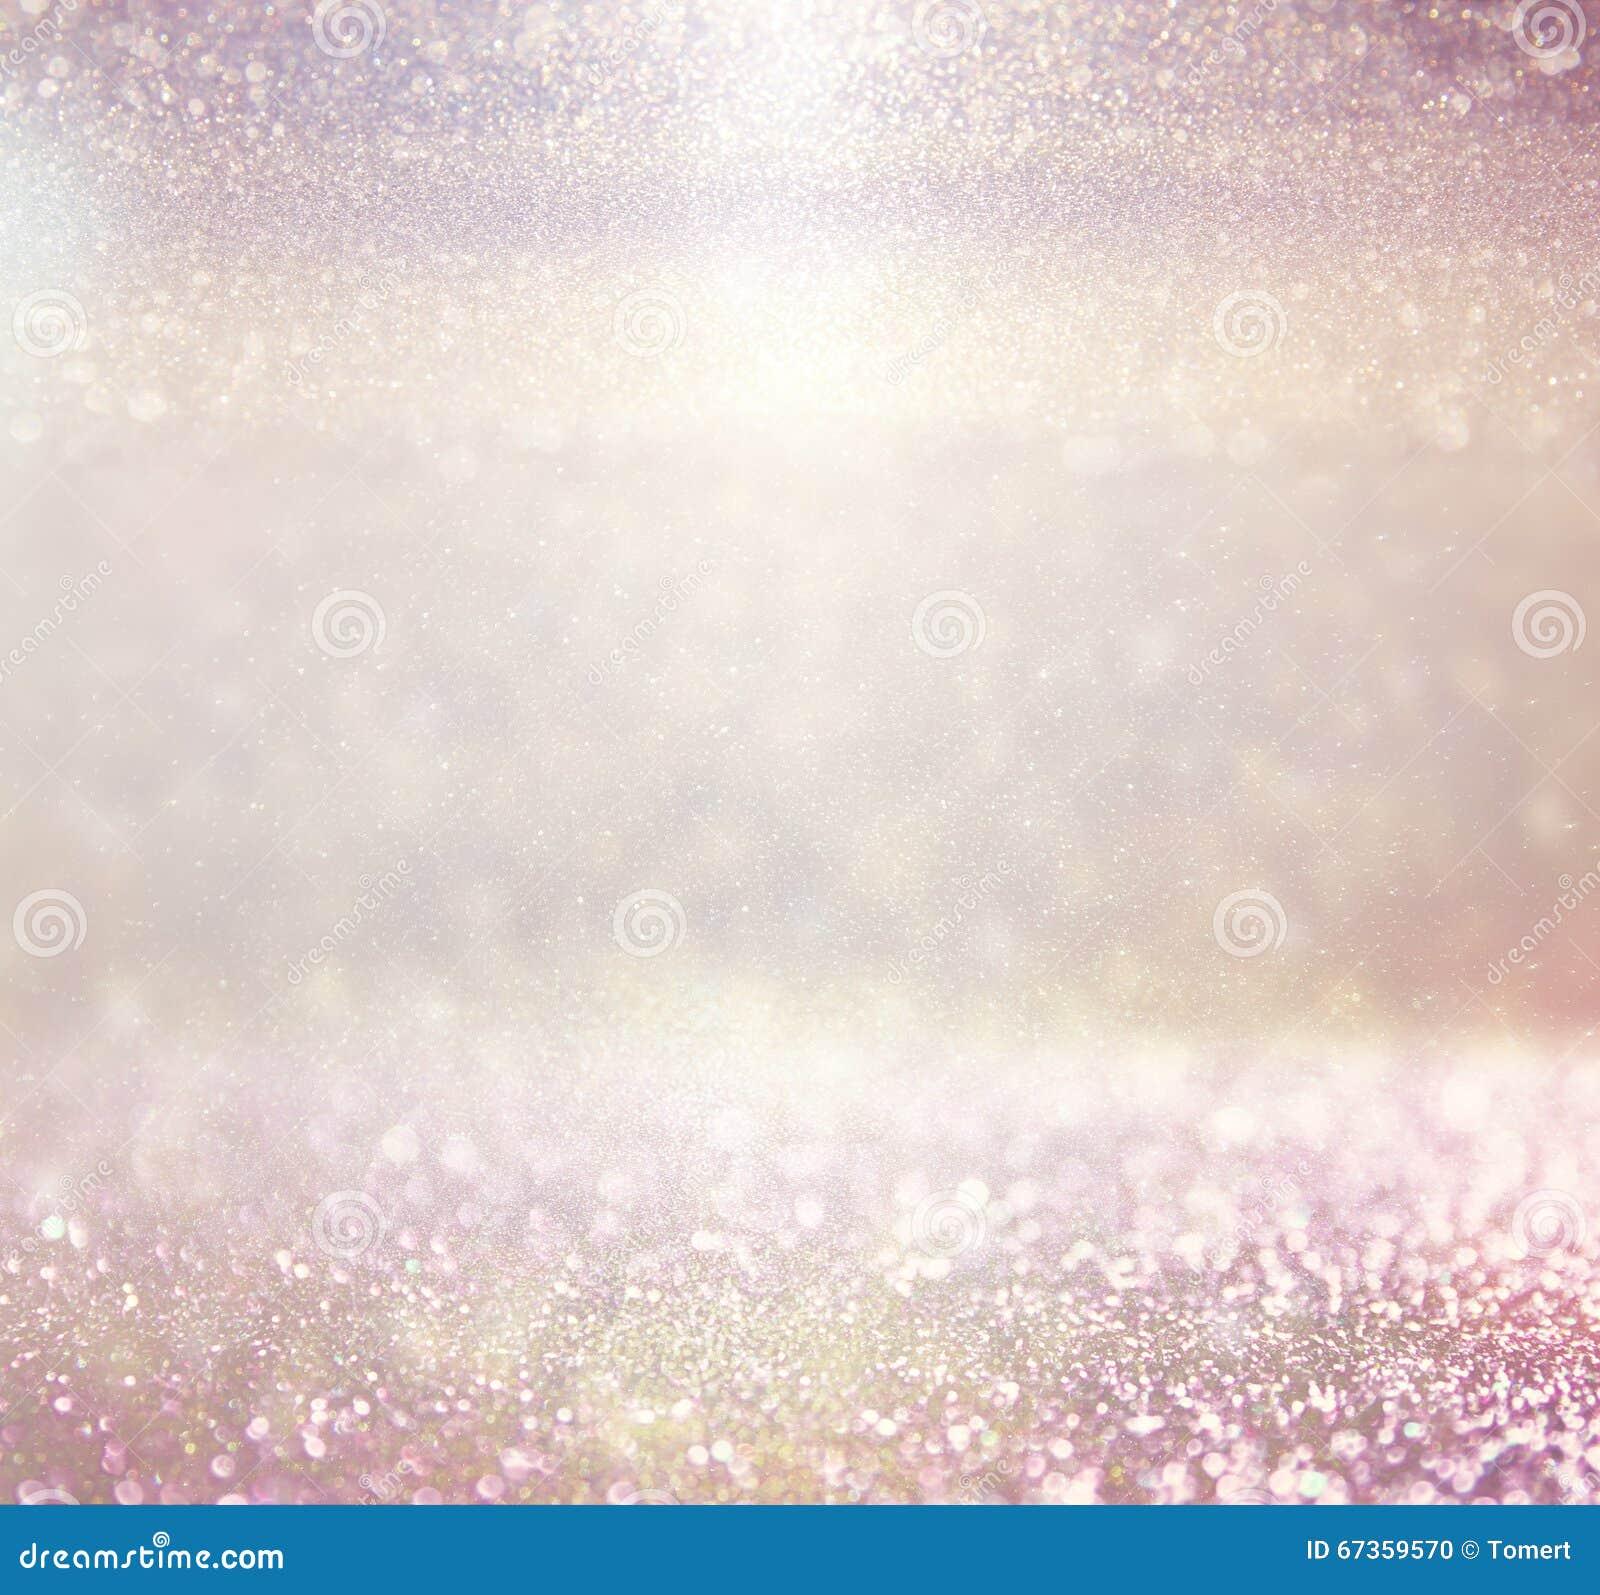 Defocused розовое фото предпосылки светов пурпура и золота